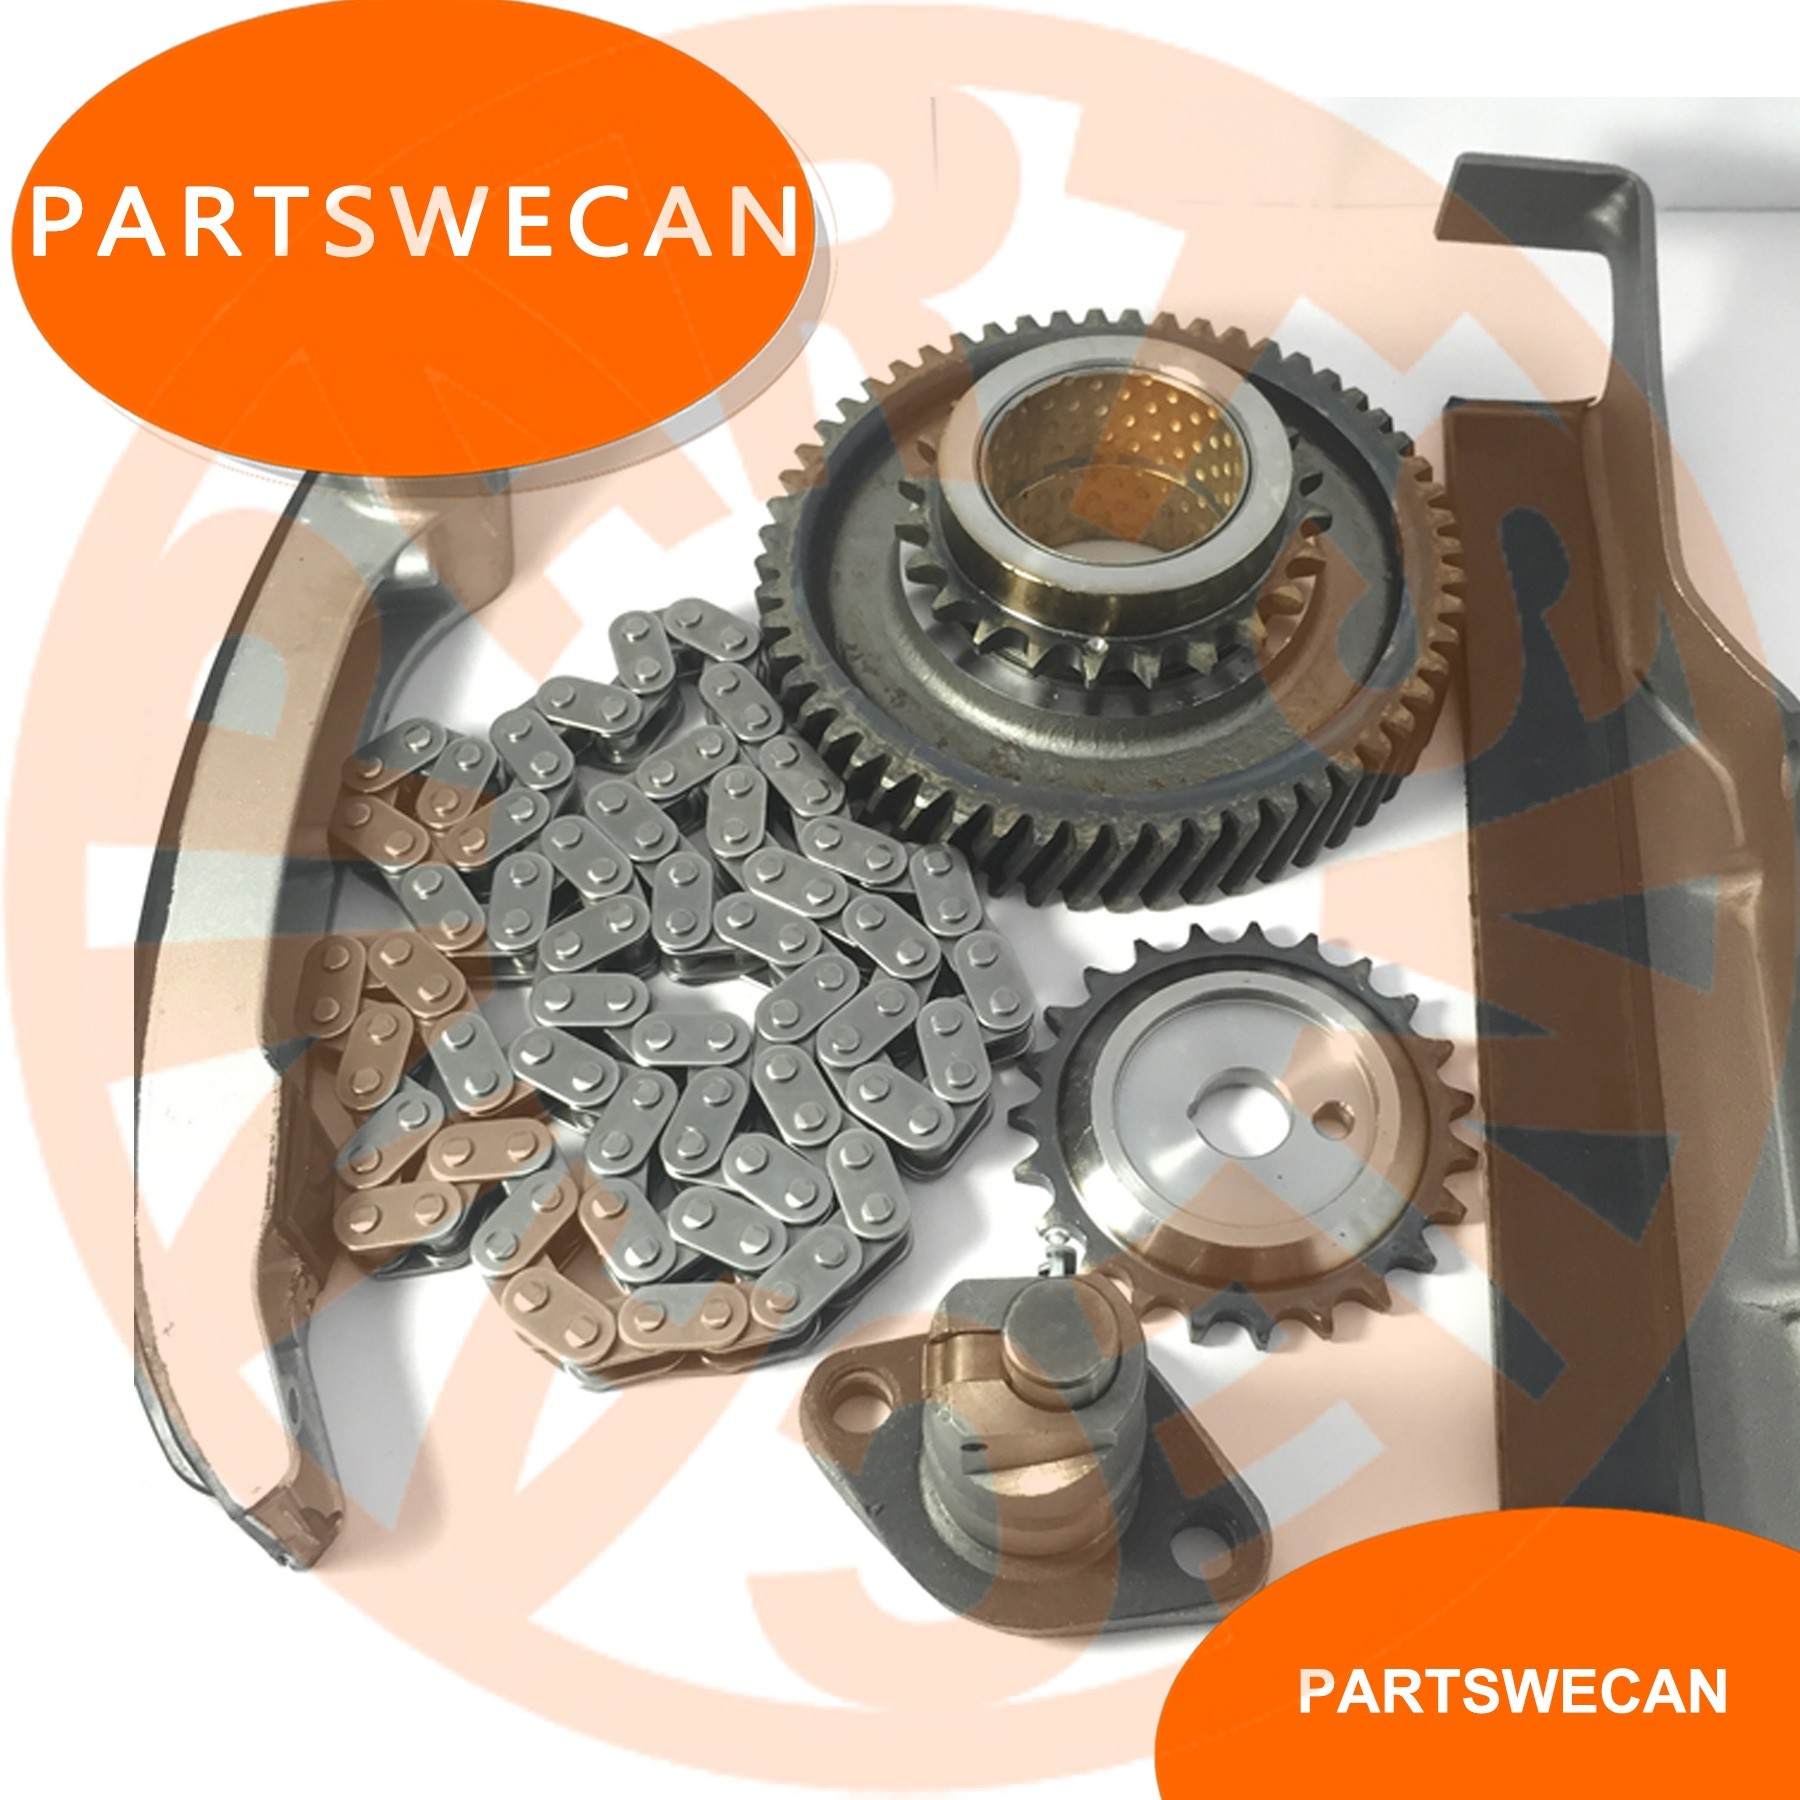 Timing Repair Kits Mitsubishi 4m40 Engine Cat Excavator Aftermarket How Toyota 4y Parts